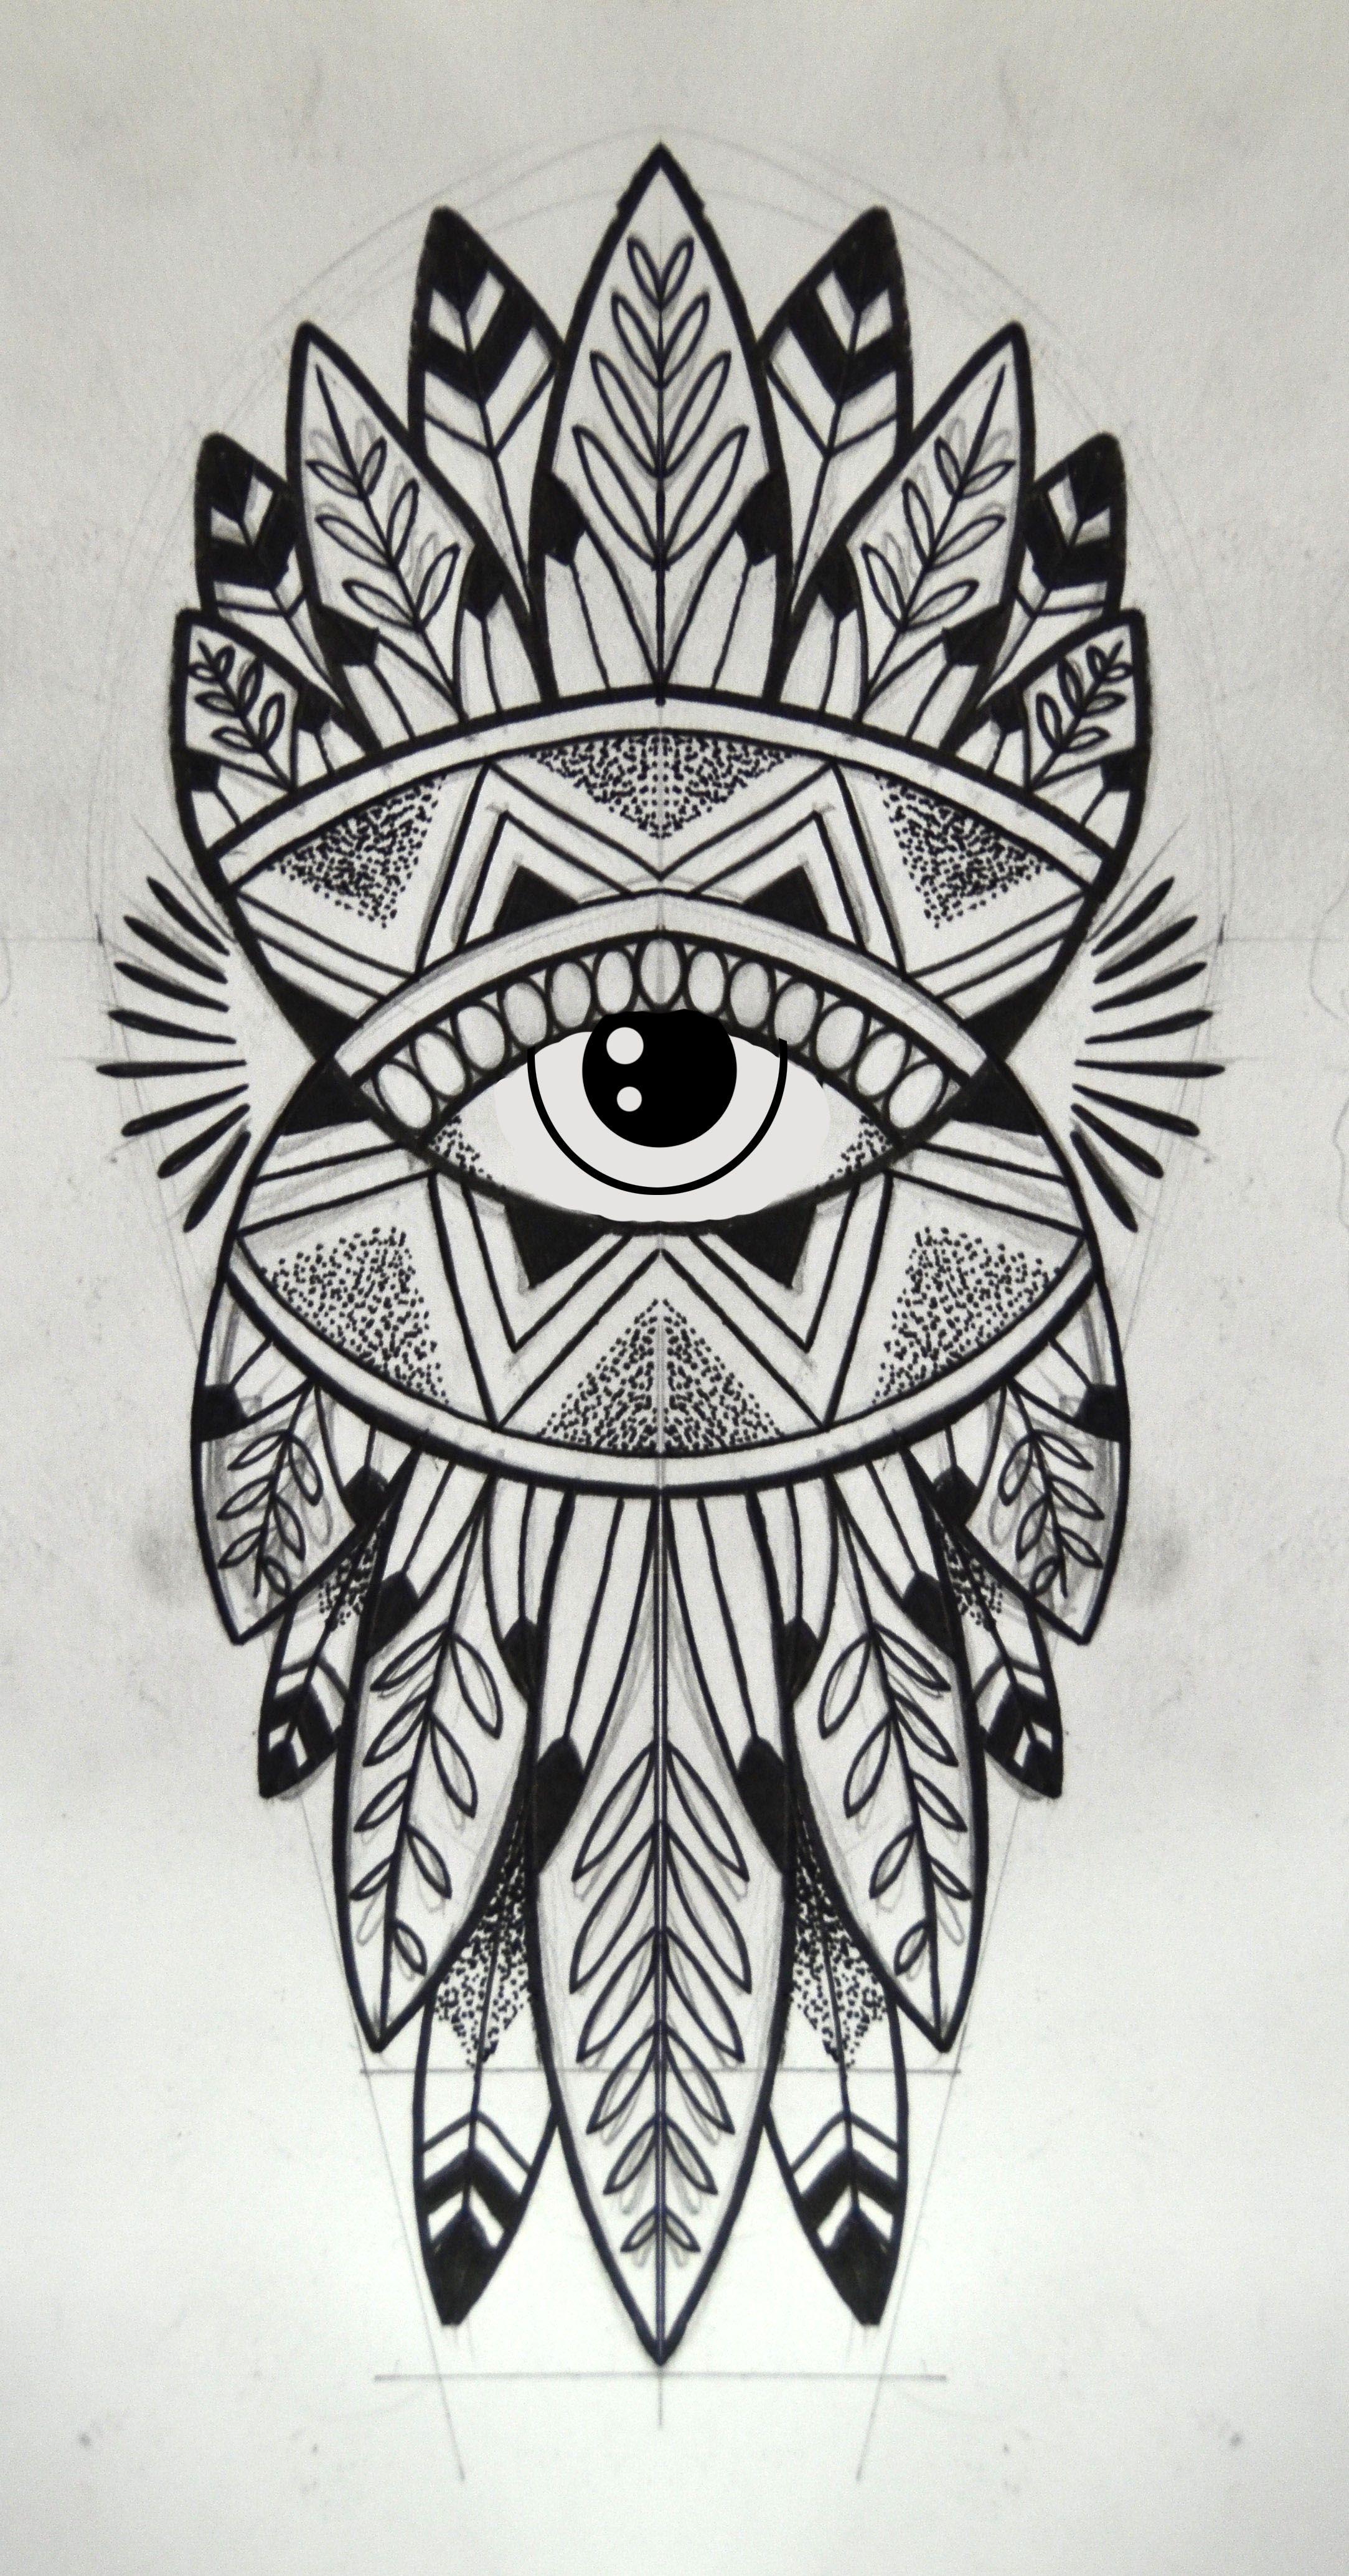 / tattoo sketch / Watch tattoo design, Inspirational